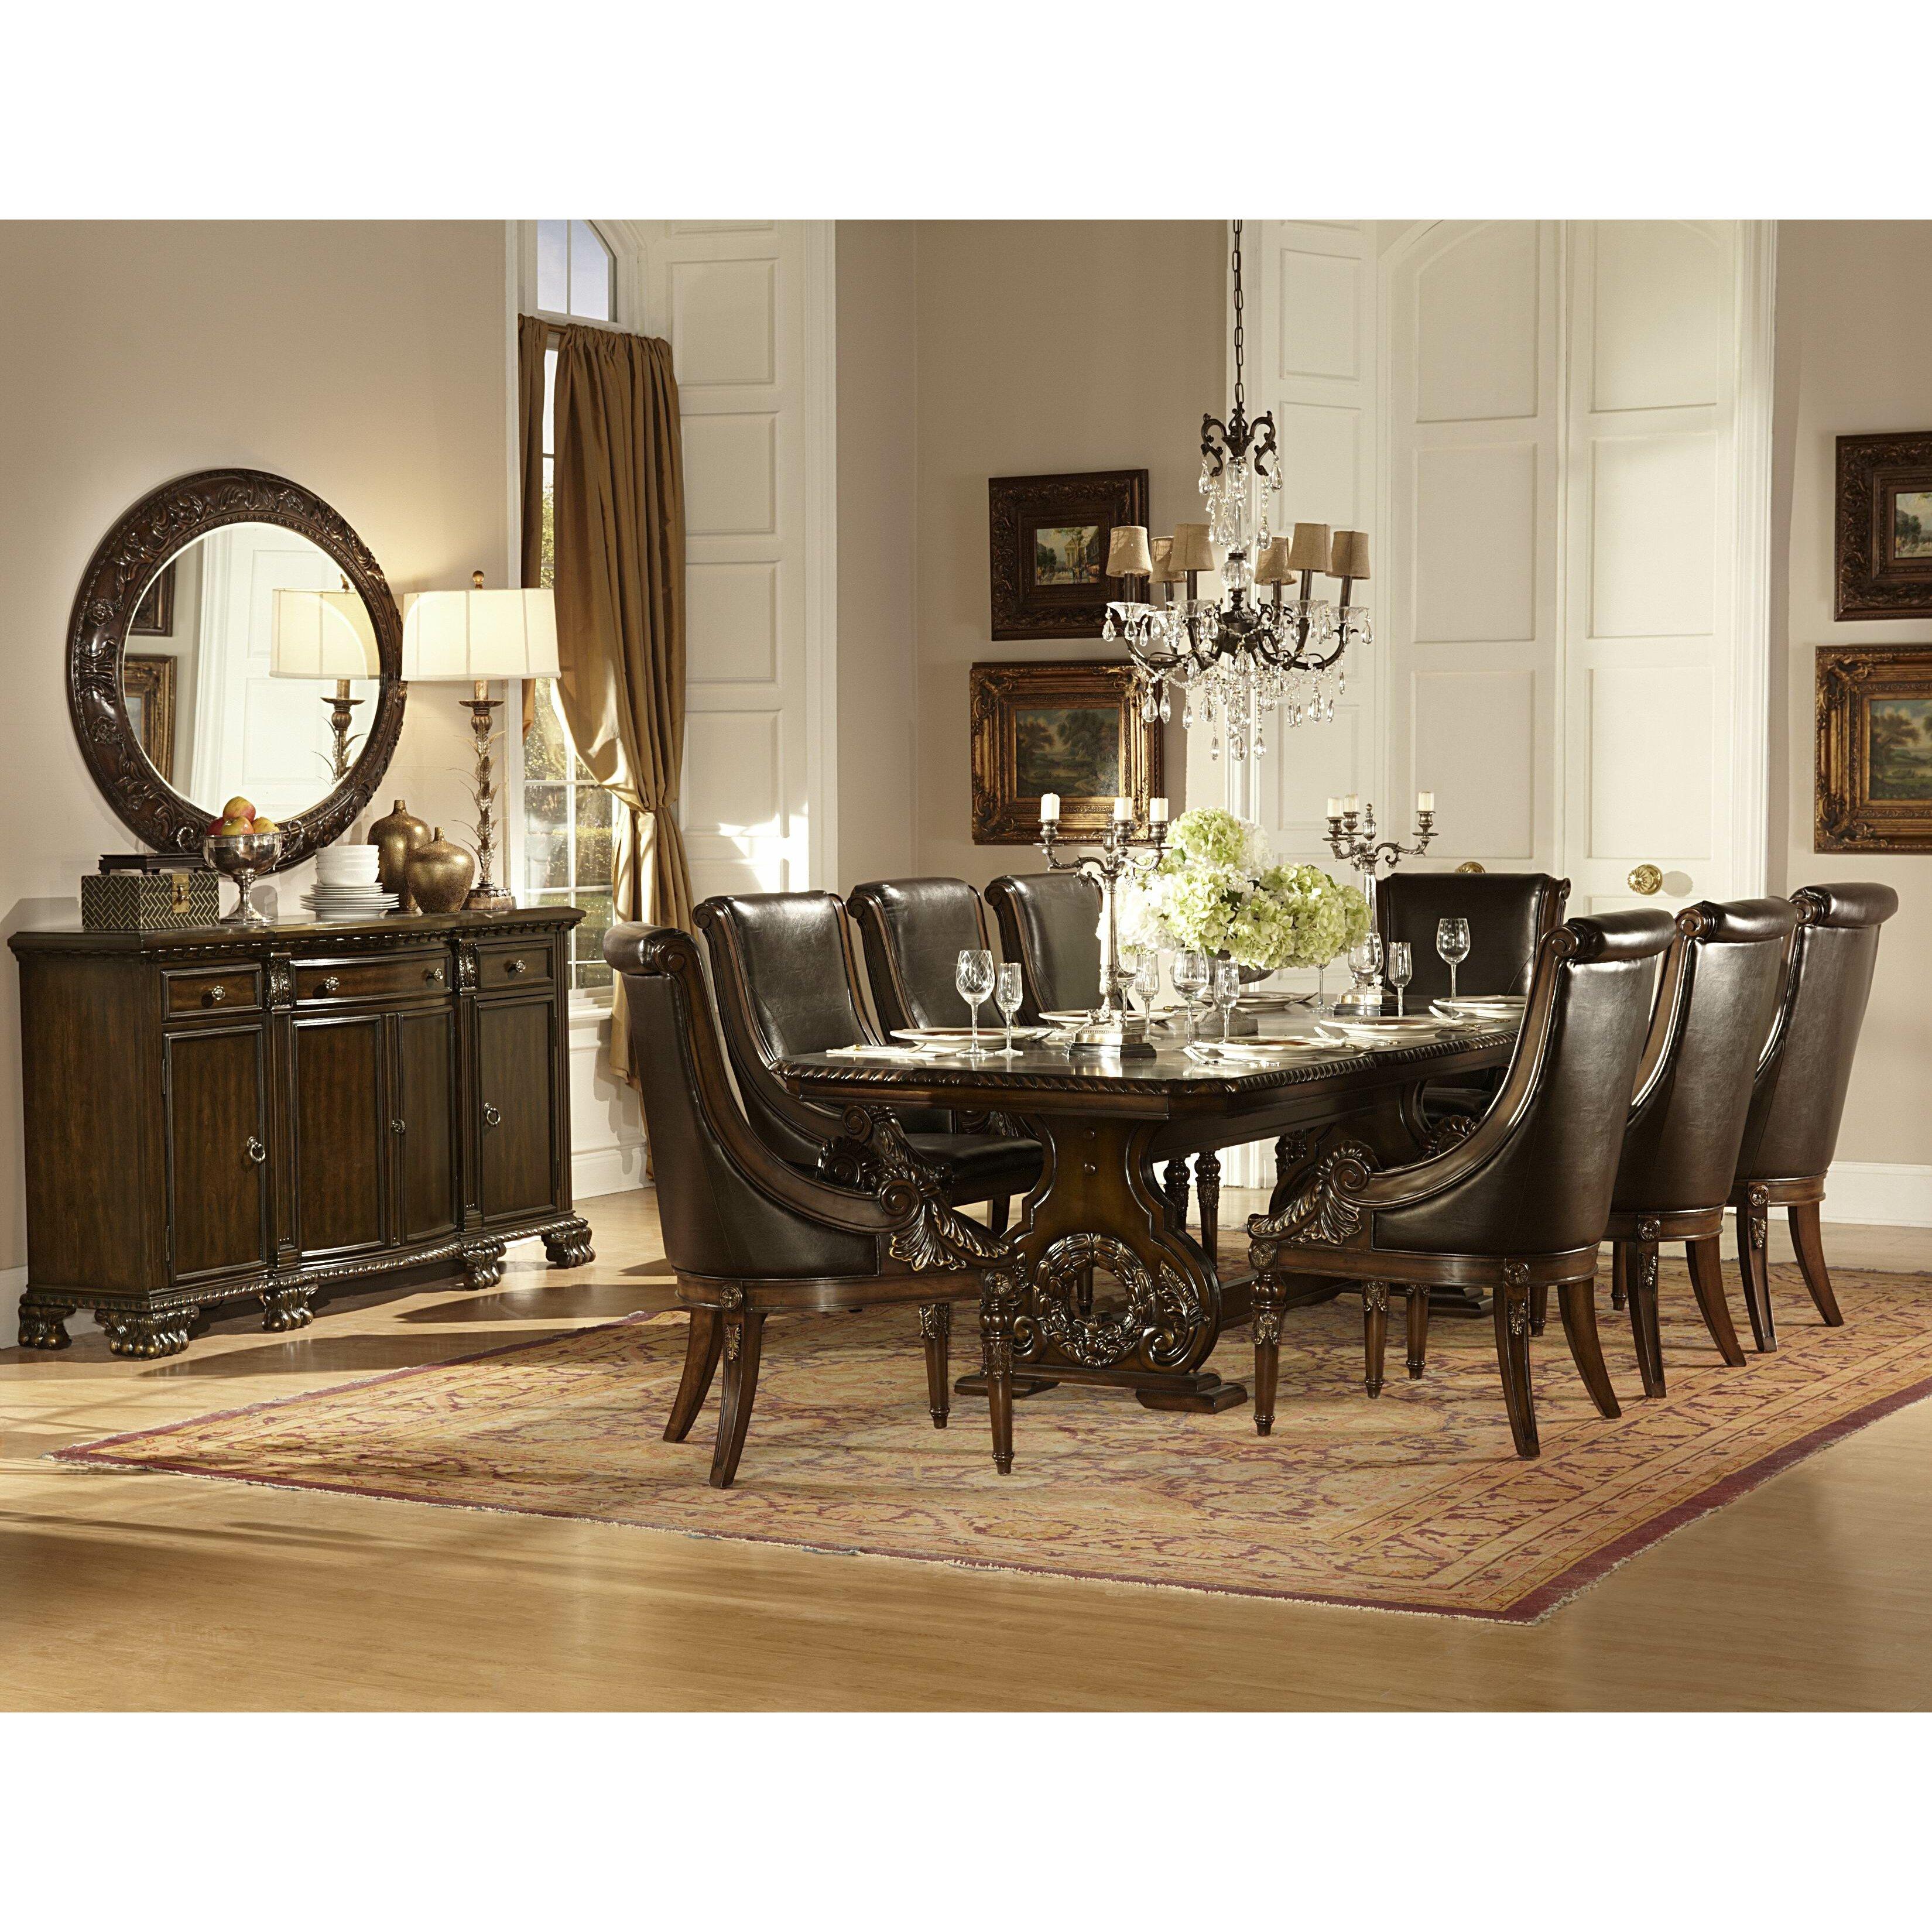 astoria grand chirk trestle extendable dining table reviews wayfair. Black Bedroom Furniture Sets. Home Design Ideas